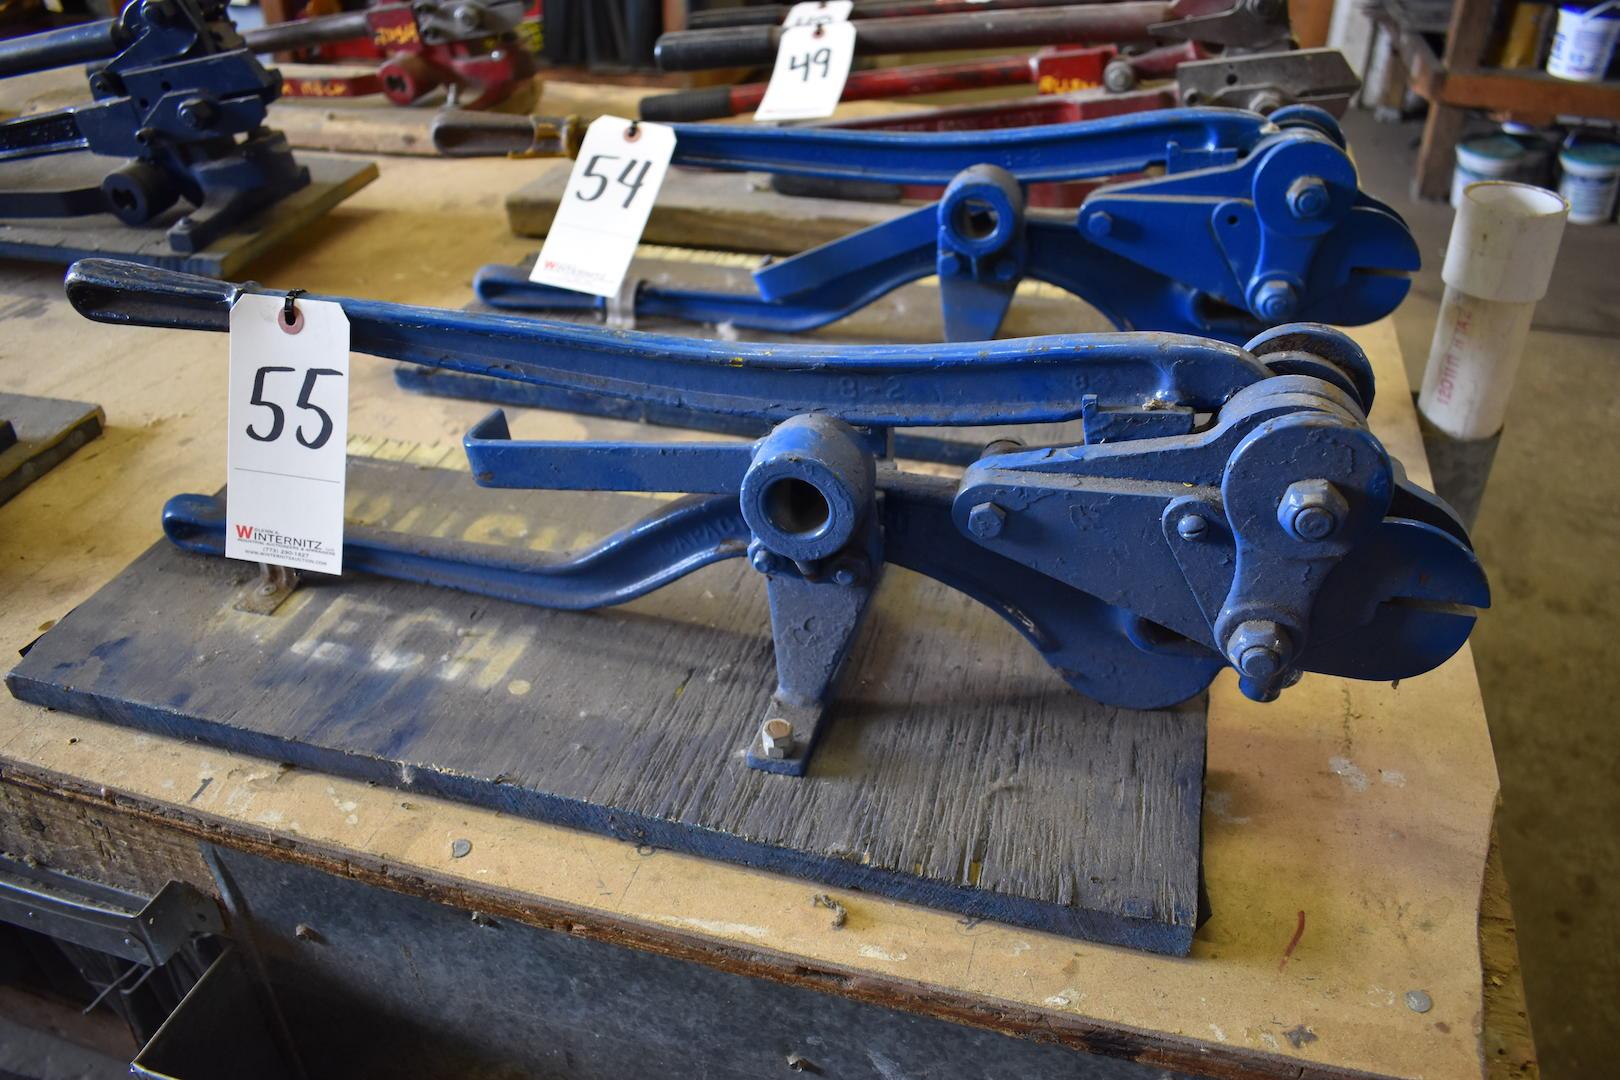 Roper Whitney 4-in-1 Hang Four Fabricator Multi-Tool